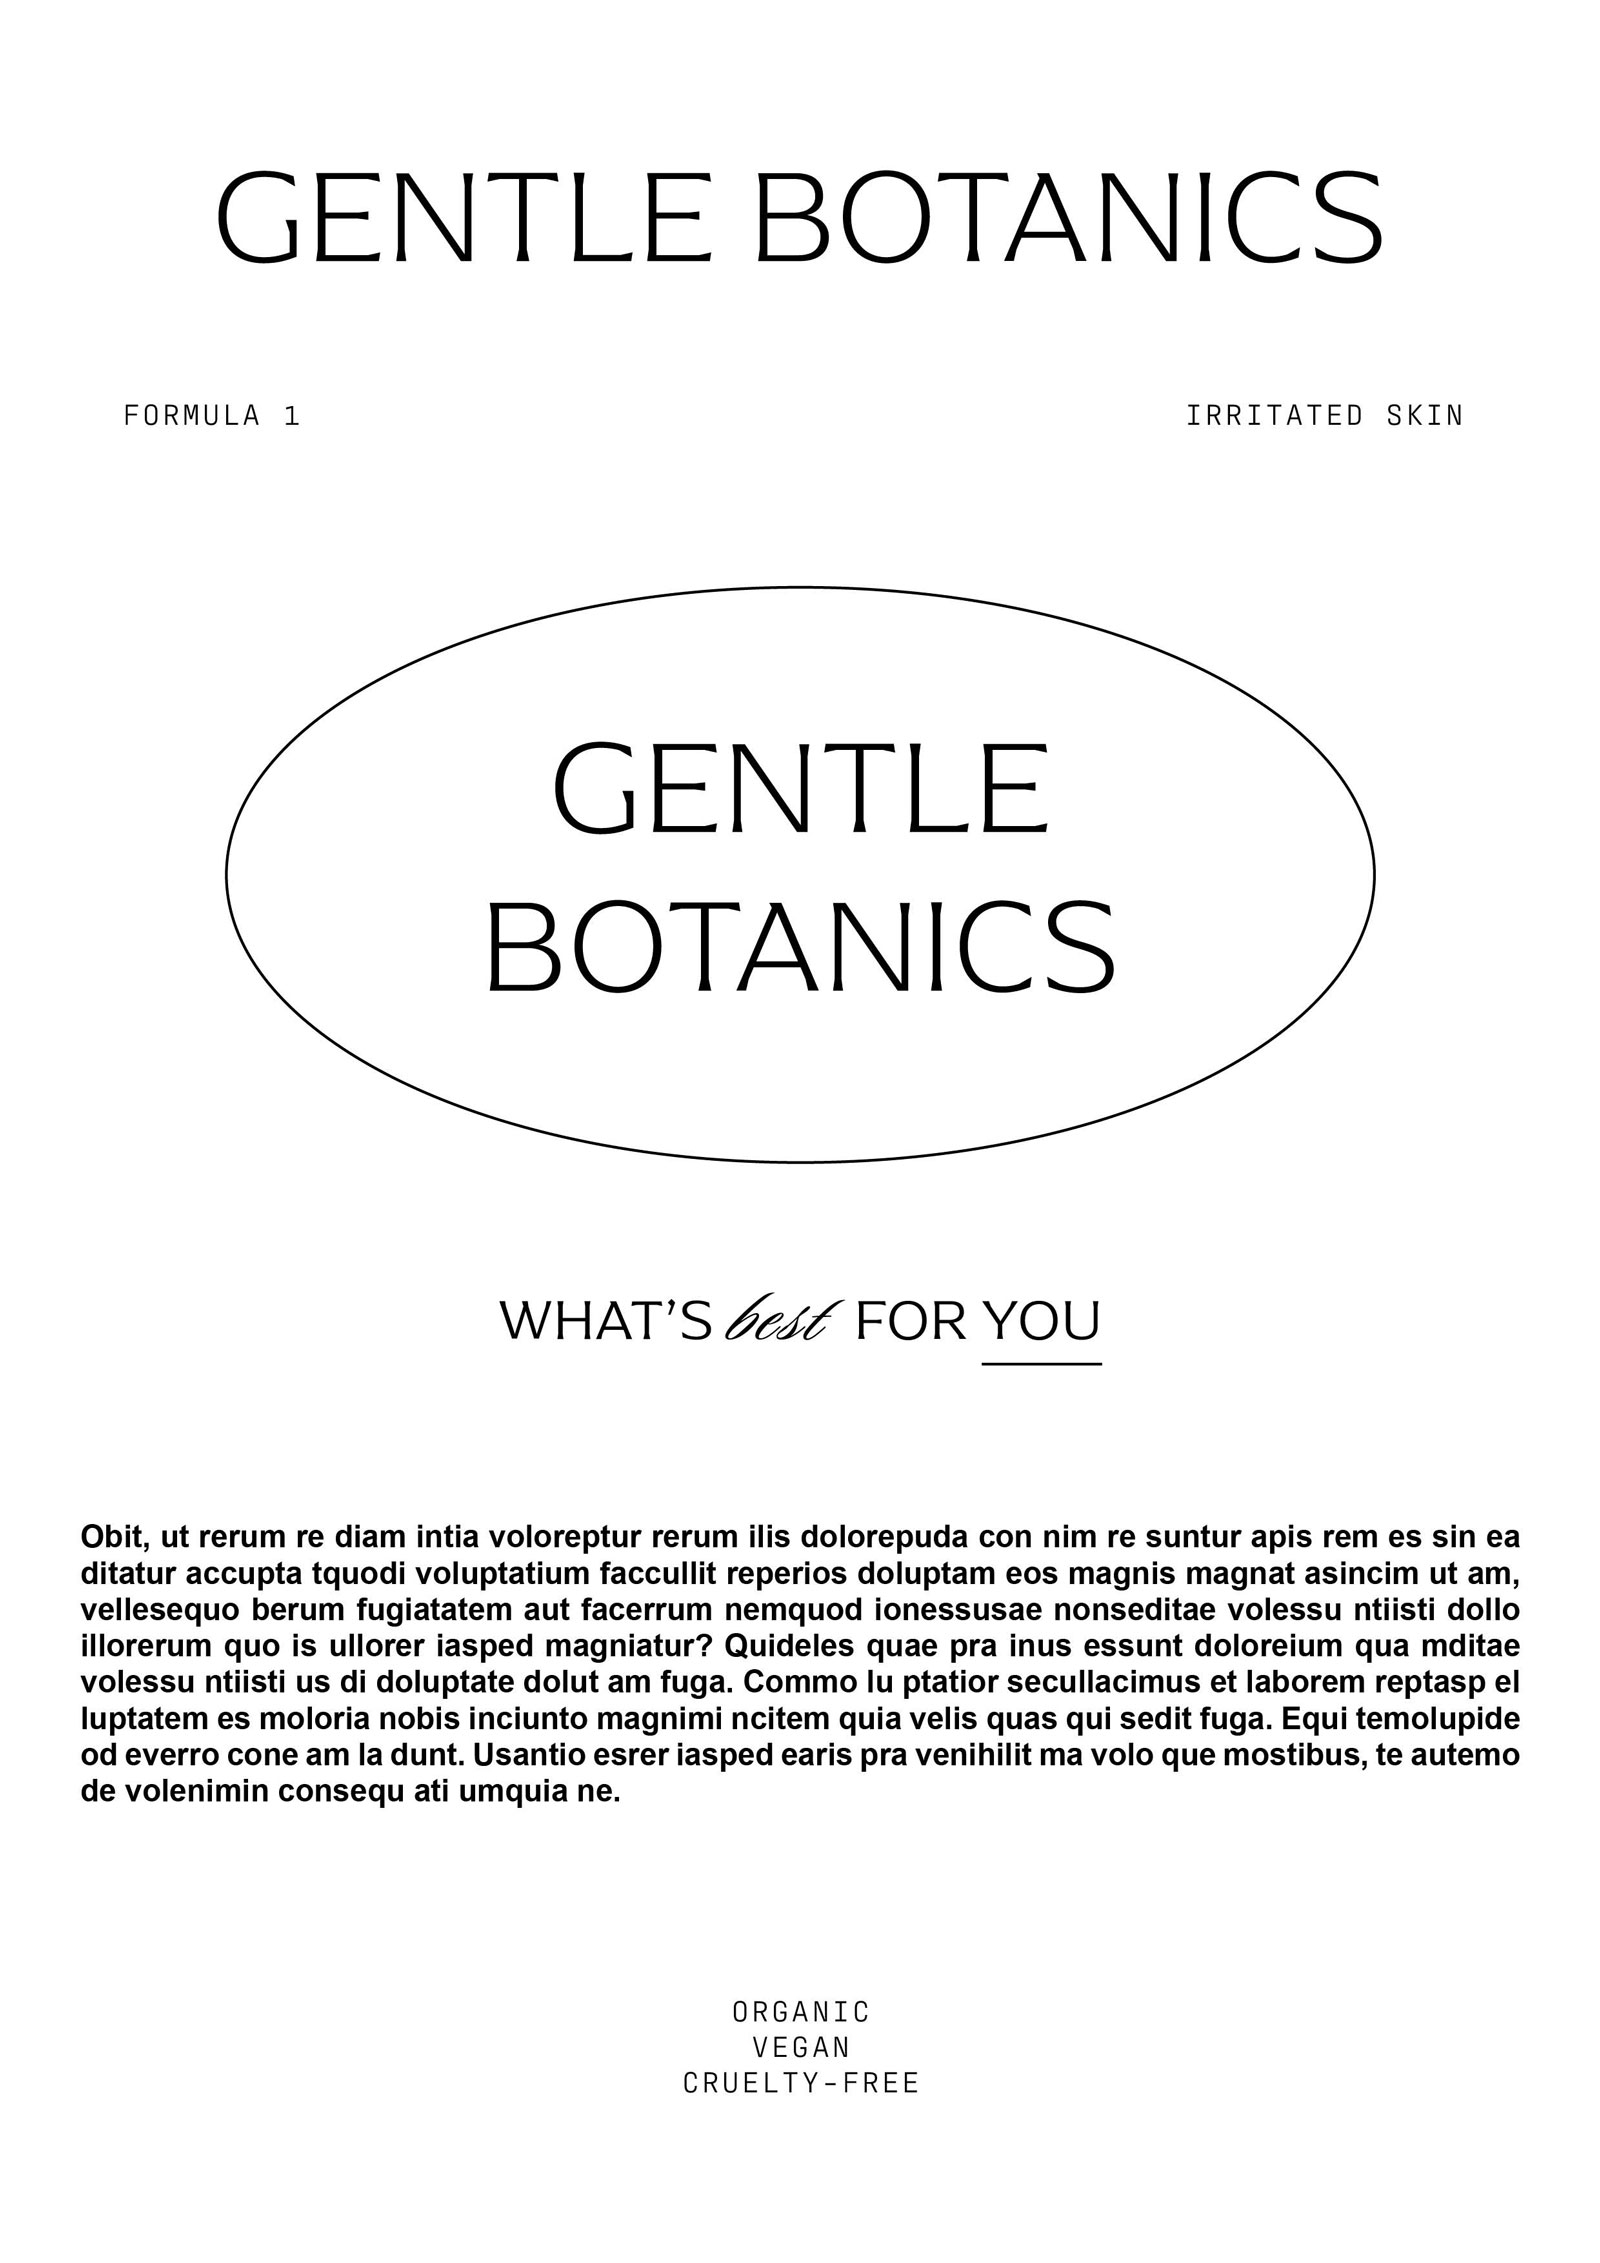 Gentle Botanics Skincare Brand Kit